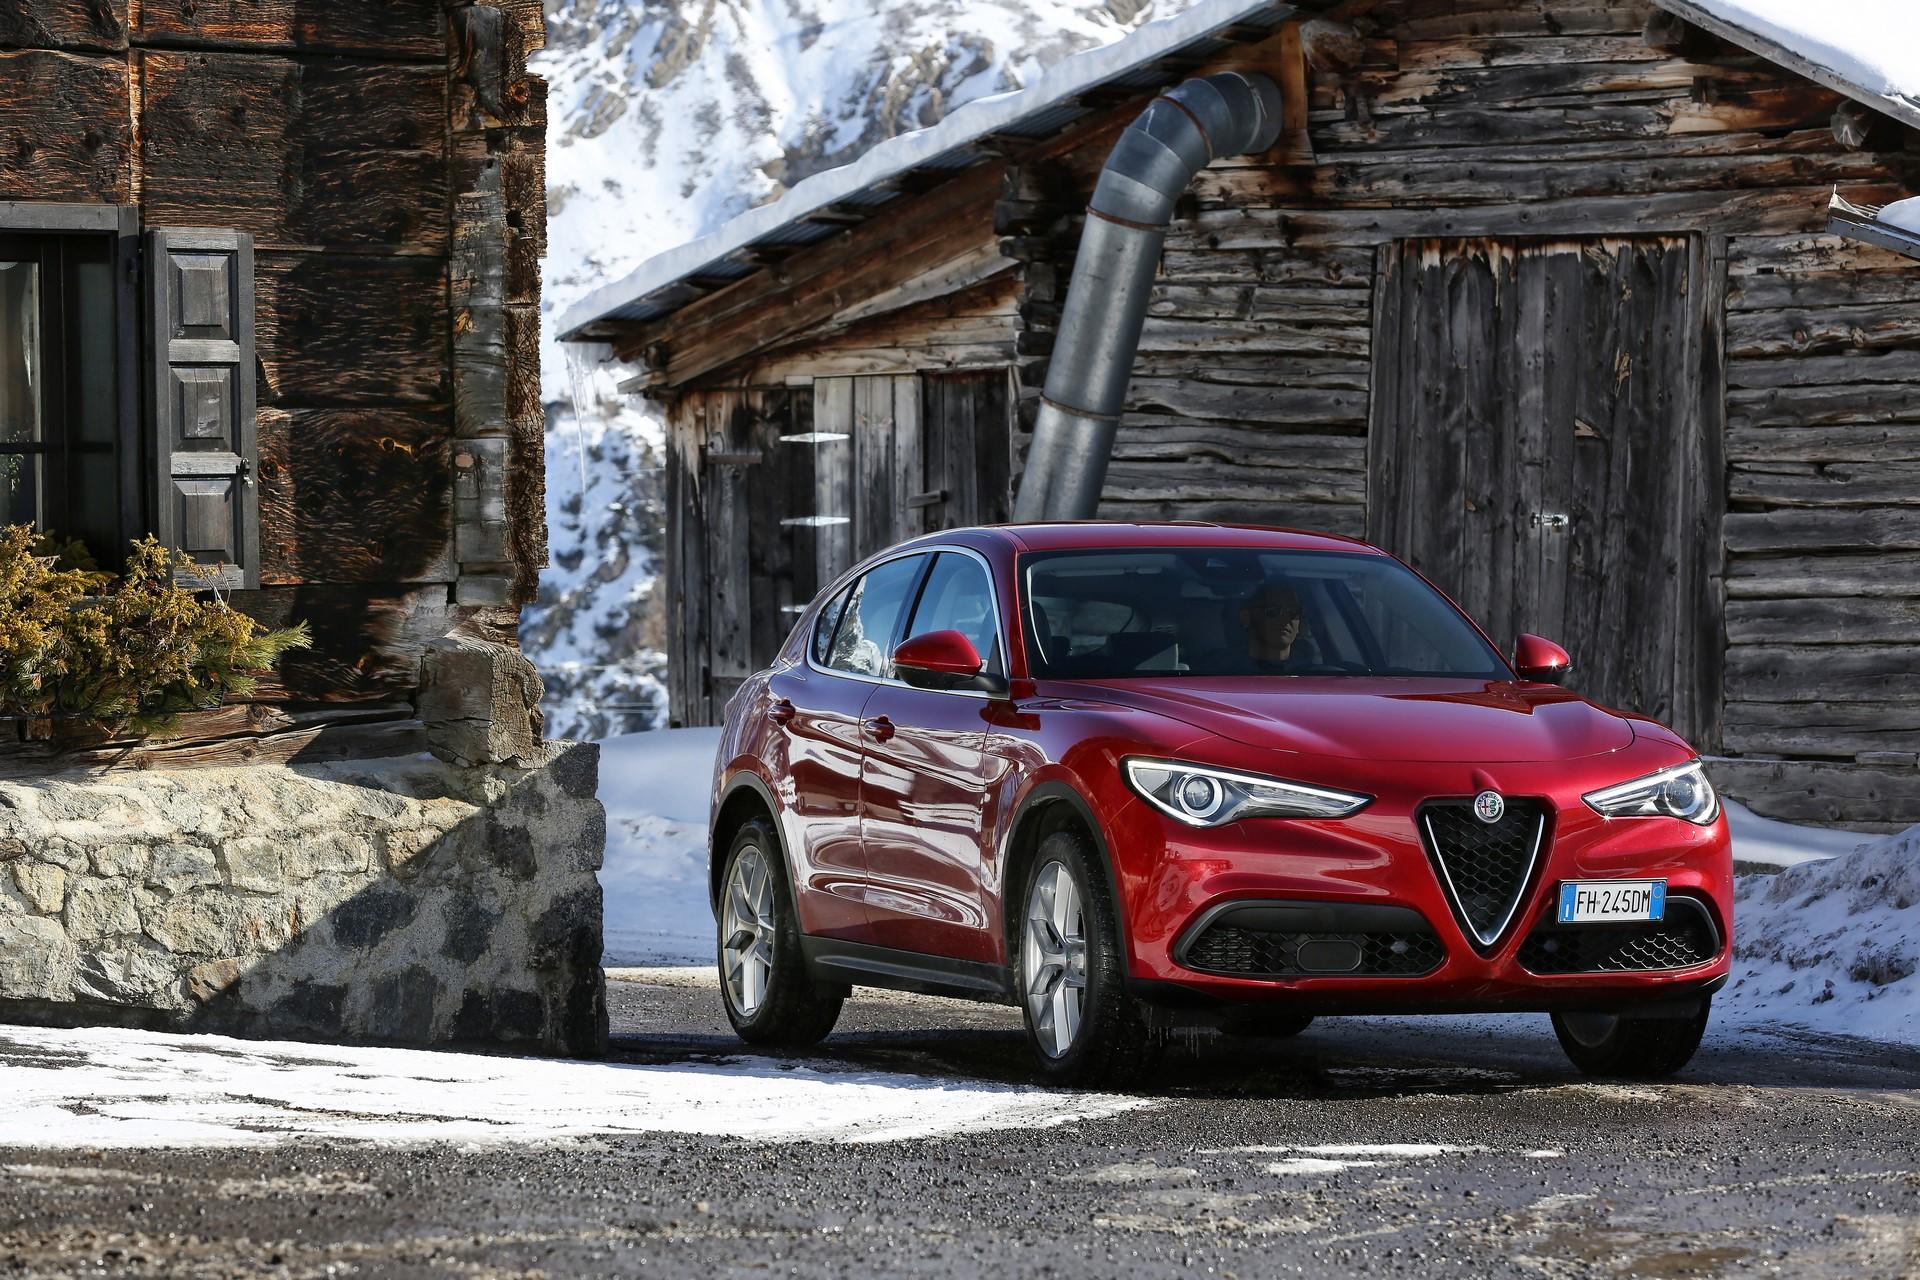 170222_Alfa-Romeo_AR-Stelvio_57